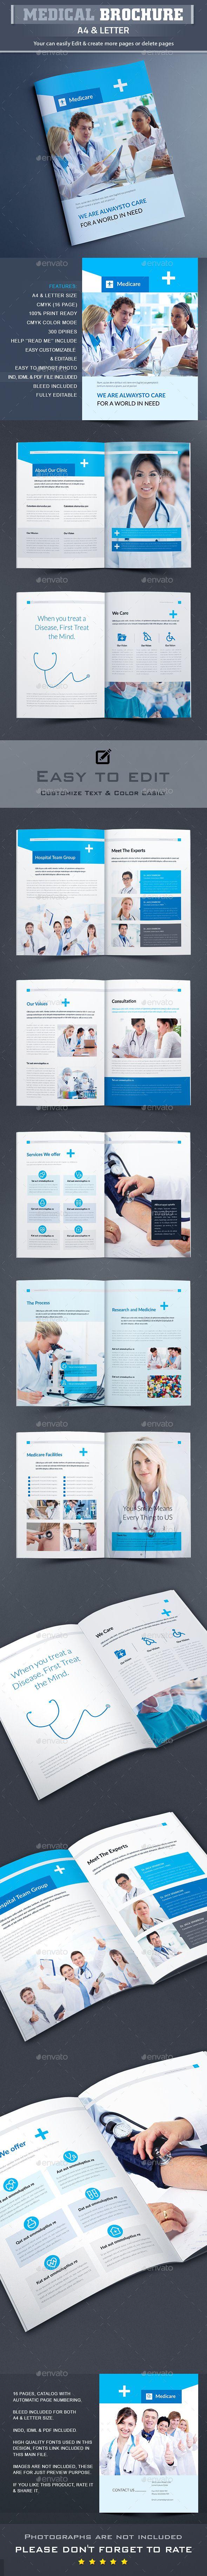 Medical Brochure Template  - Brochures Print Templates